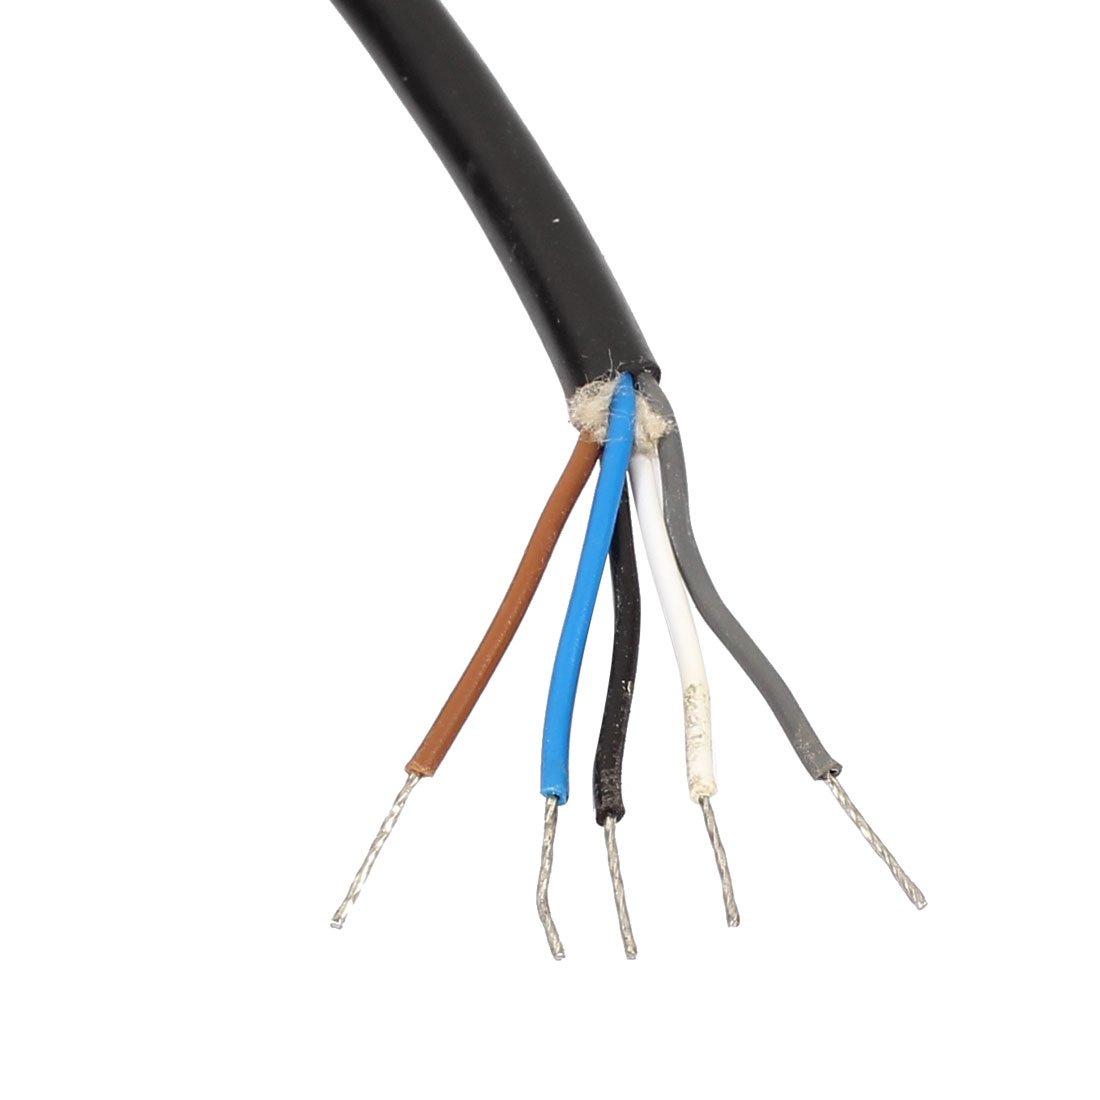 sourcing map M12 2M Buchse rechtwinklig 5 Pin Stecker Luftfahrt Steckdose Elektrisches Kabel DE de